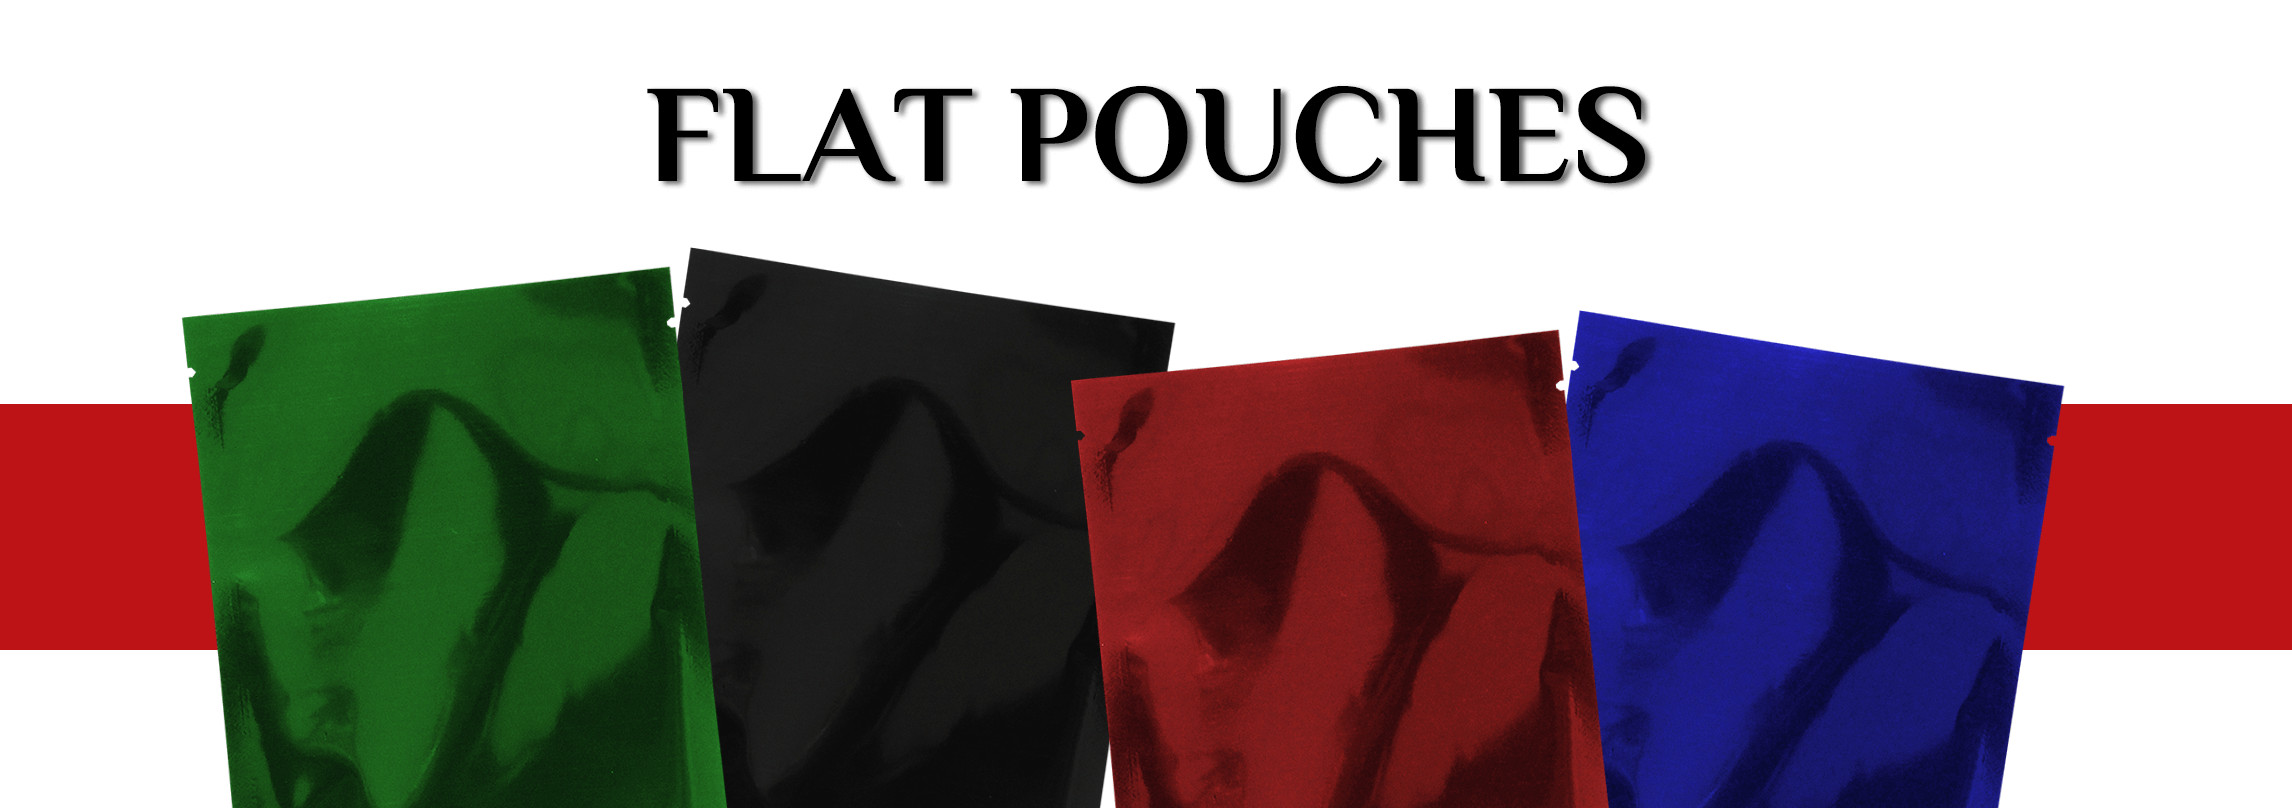 Best Flat Pouches